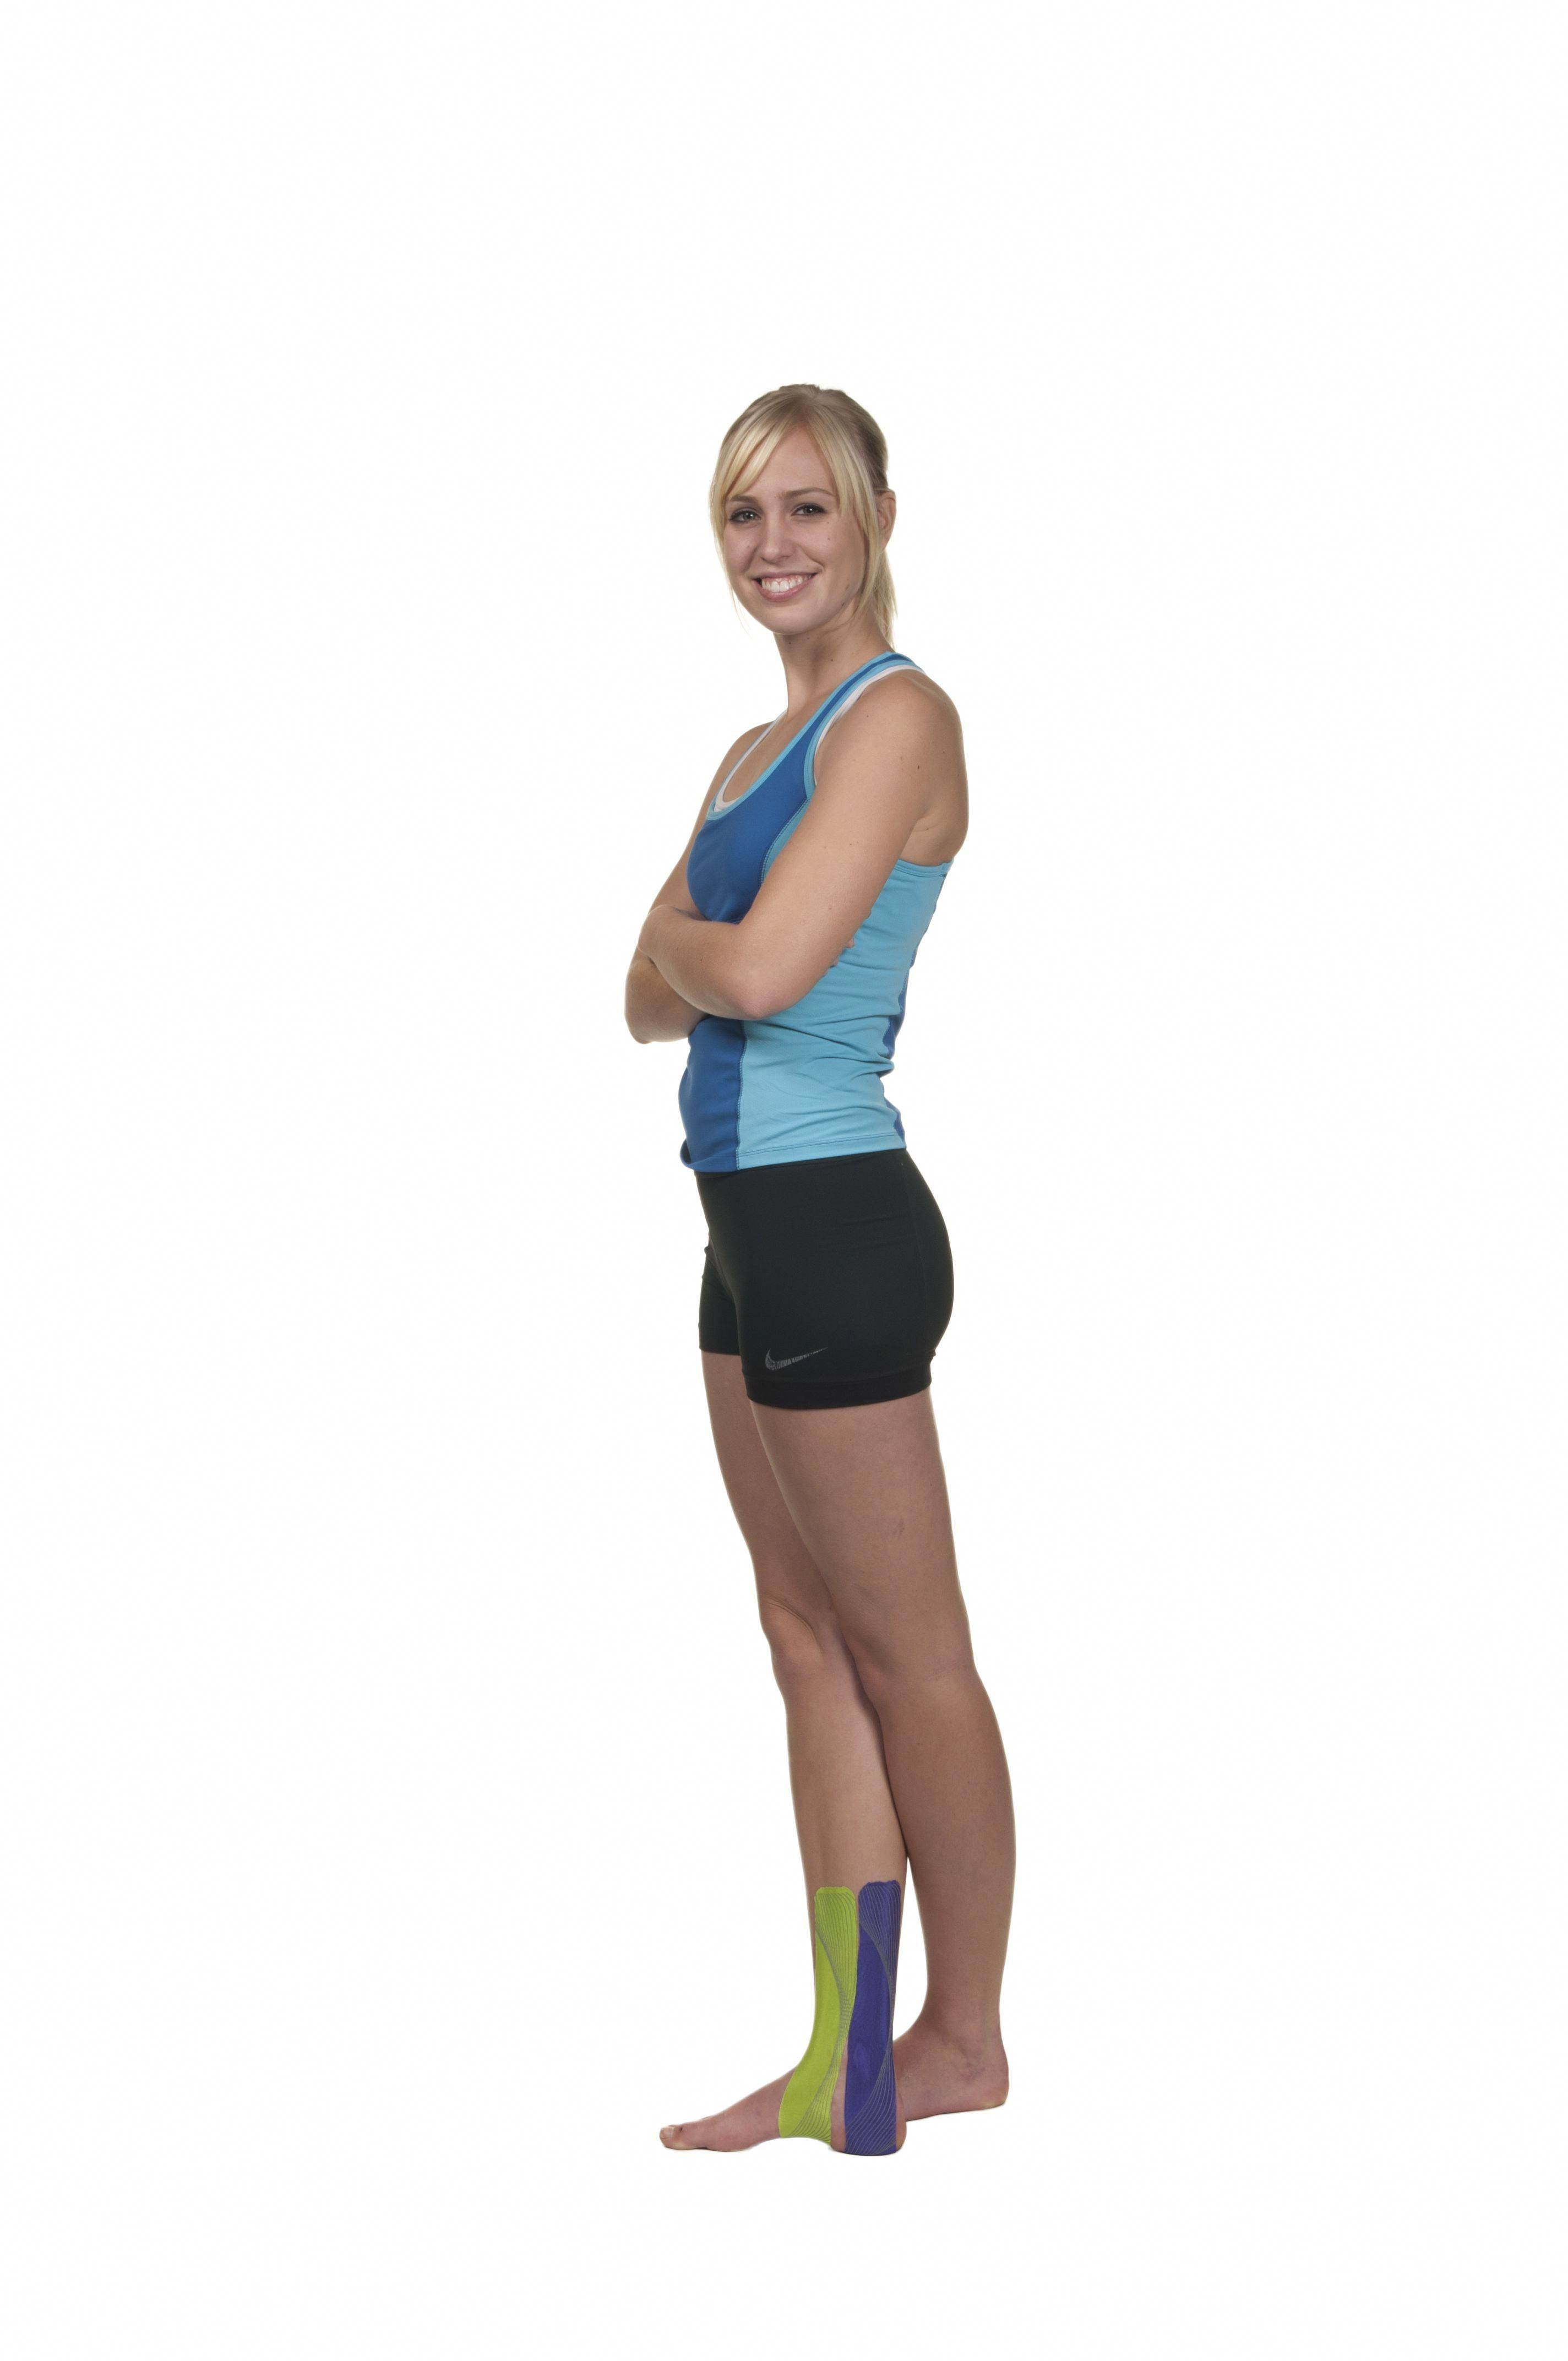 Learn to Treat And Manage Your Shin Splints Shin splints